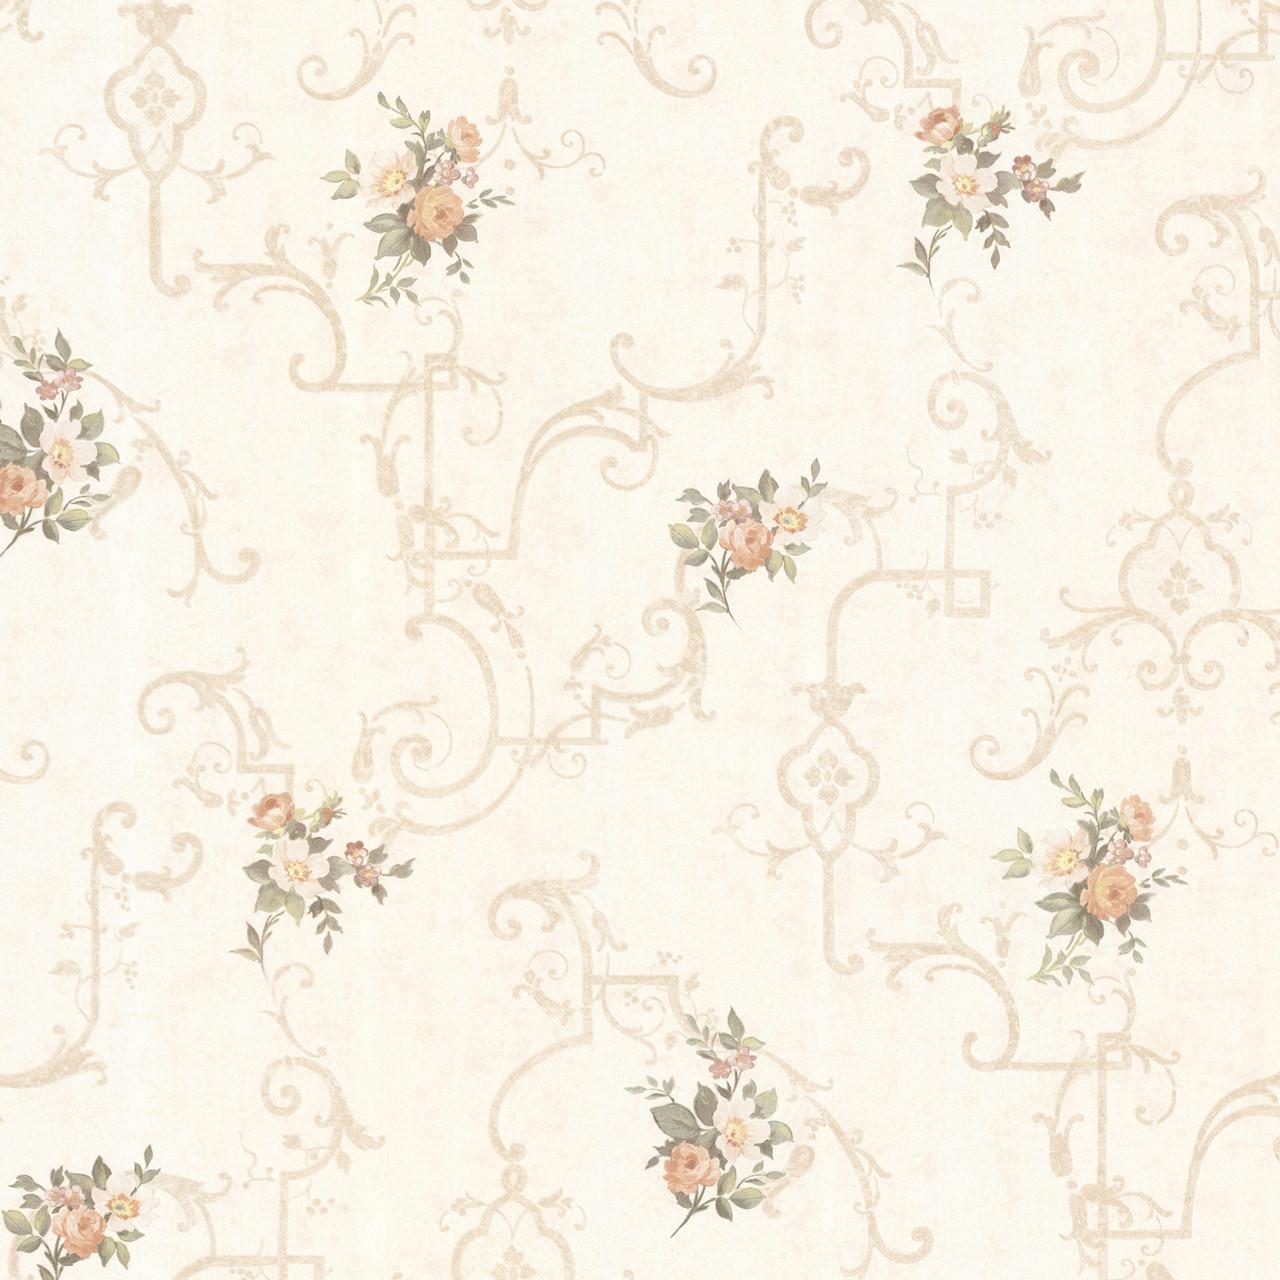 992 68309 Lori Peach Floral Trellis Wallpaper Indoorwallpaper Com